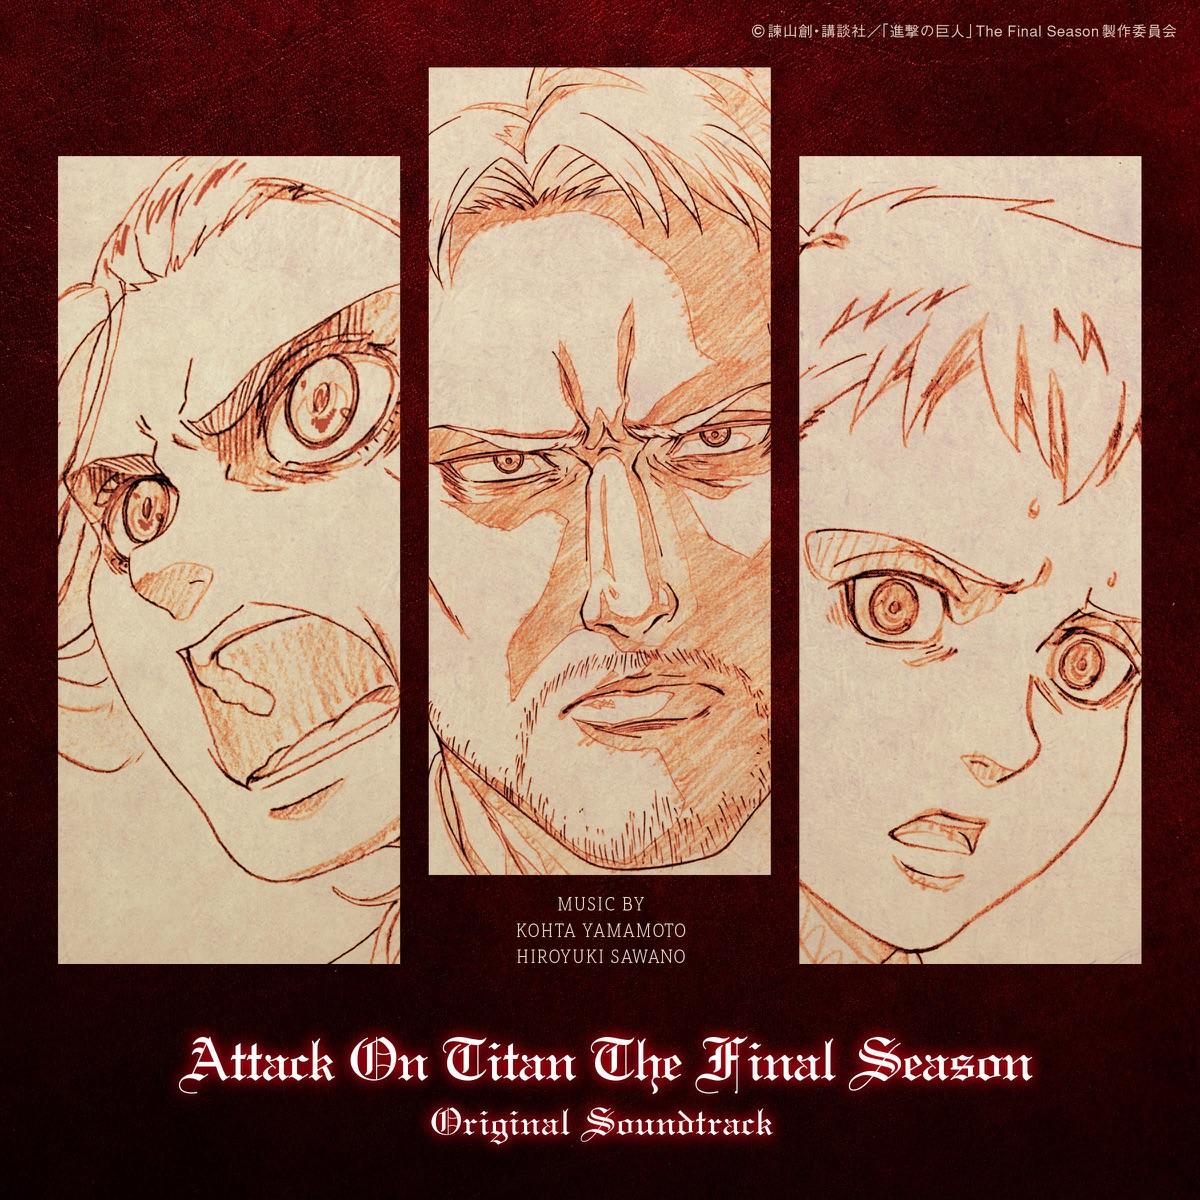 『KOHTA YAMAMOTO - Memory Lane』収録の『TVアニメ「進撃の巨人」 The Final Season Original Soundtrack』ジャケット